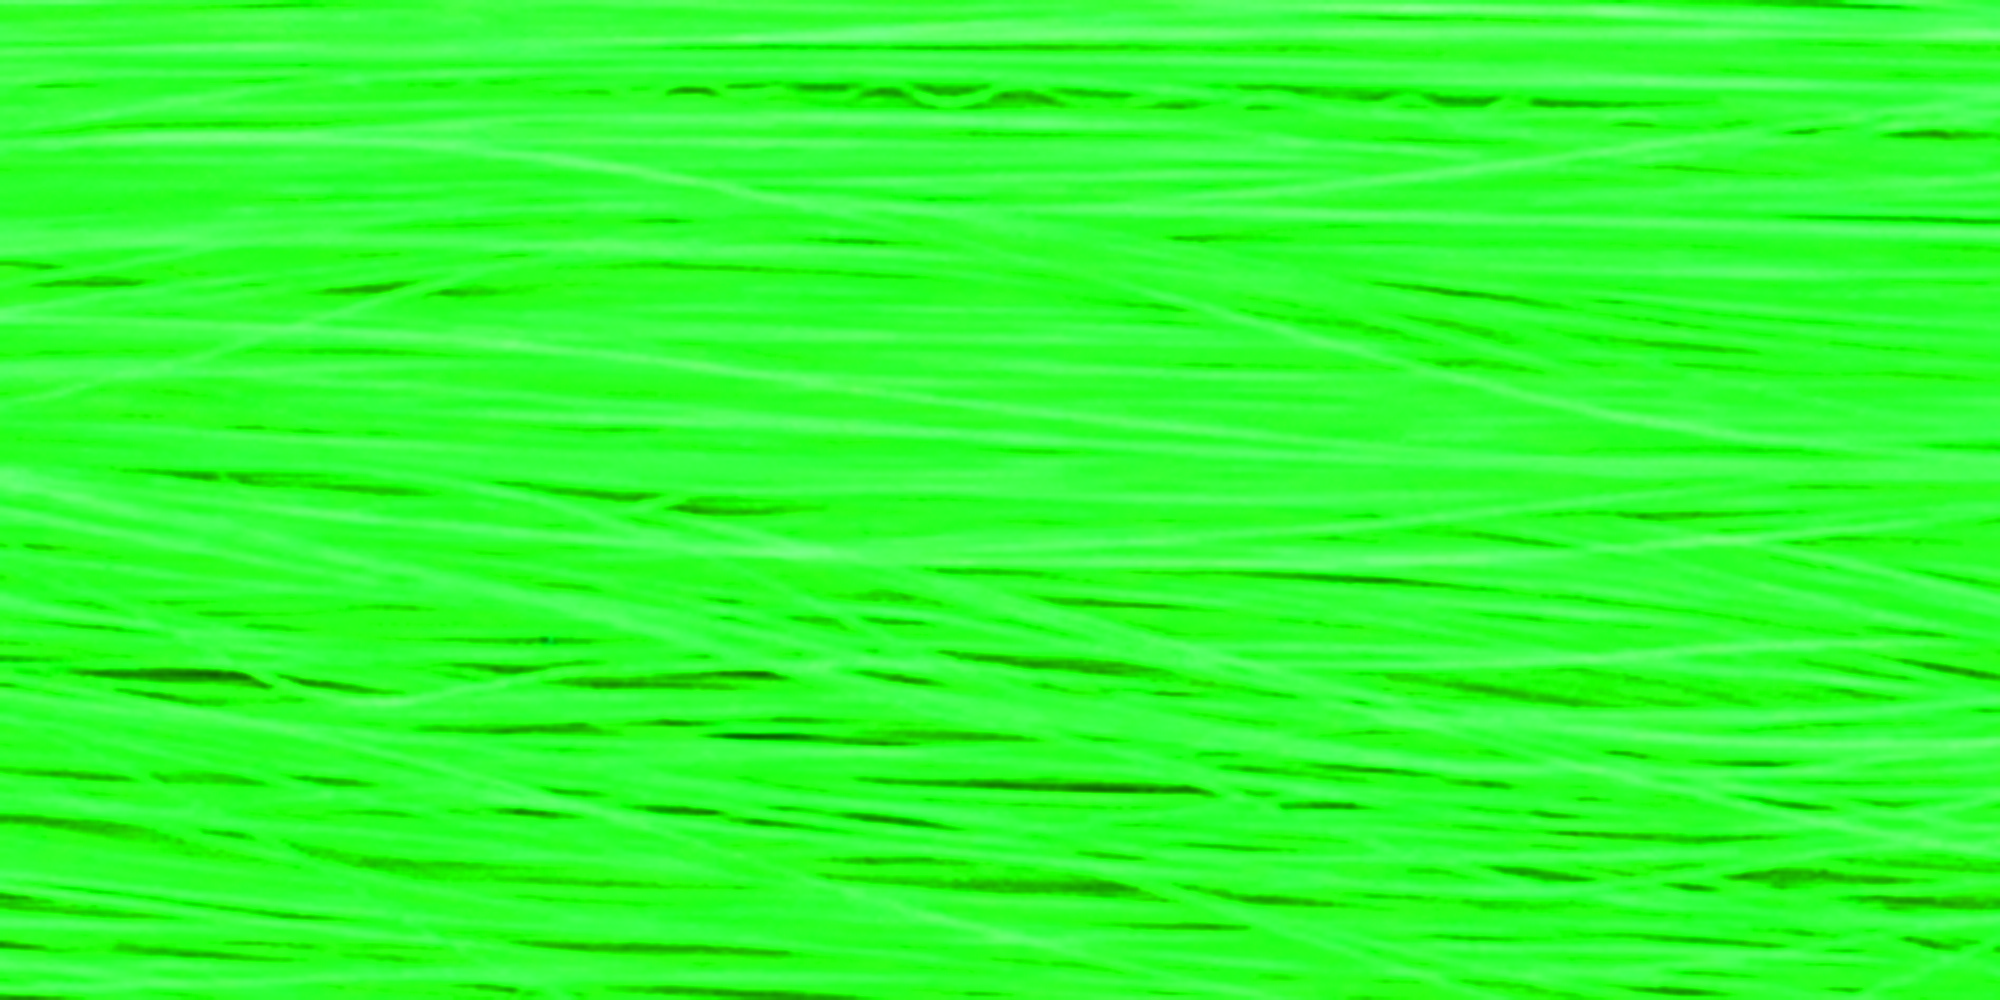 Stargazer-Baby-Hair-Extension-Synthetic-Clip-on-Streak-Various-Colors-43cm thumbnail 21